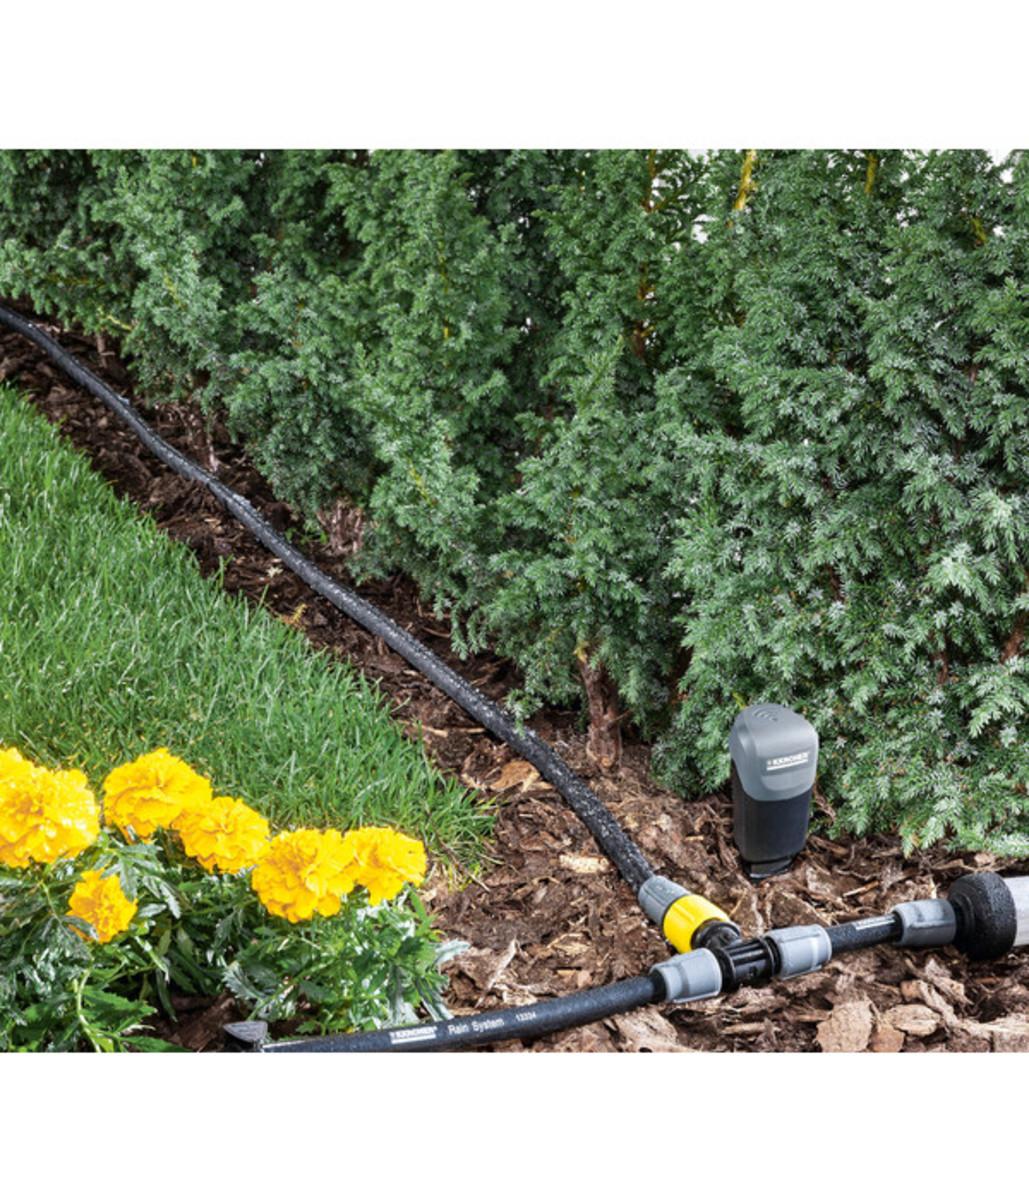 Bild 5 von Kärcher Bewässerungscomputer SensoTimer ST 6 eco!ogic